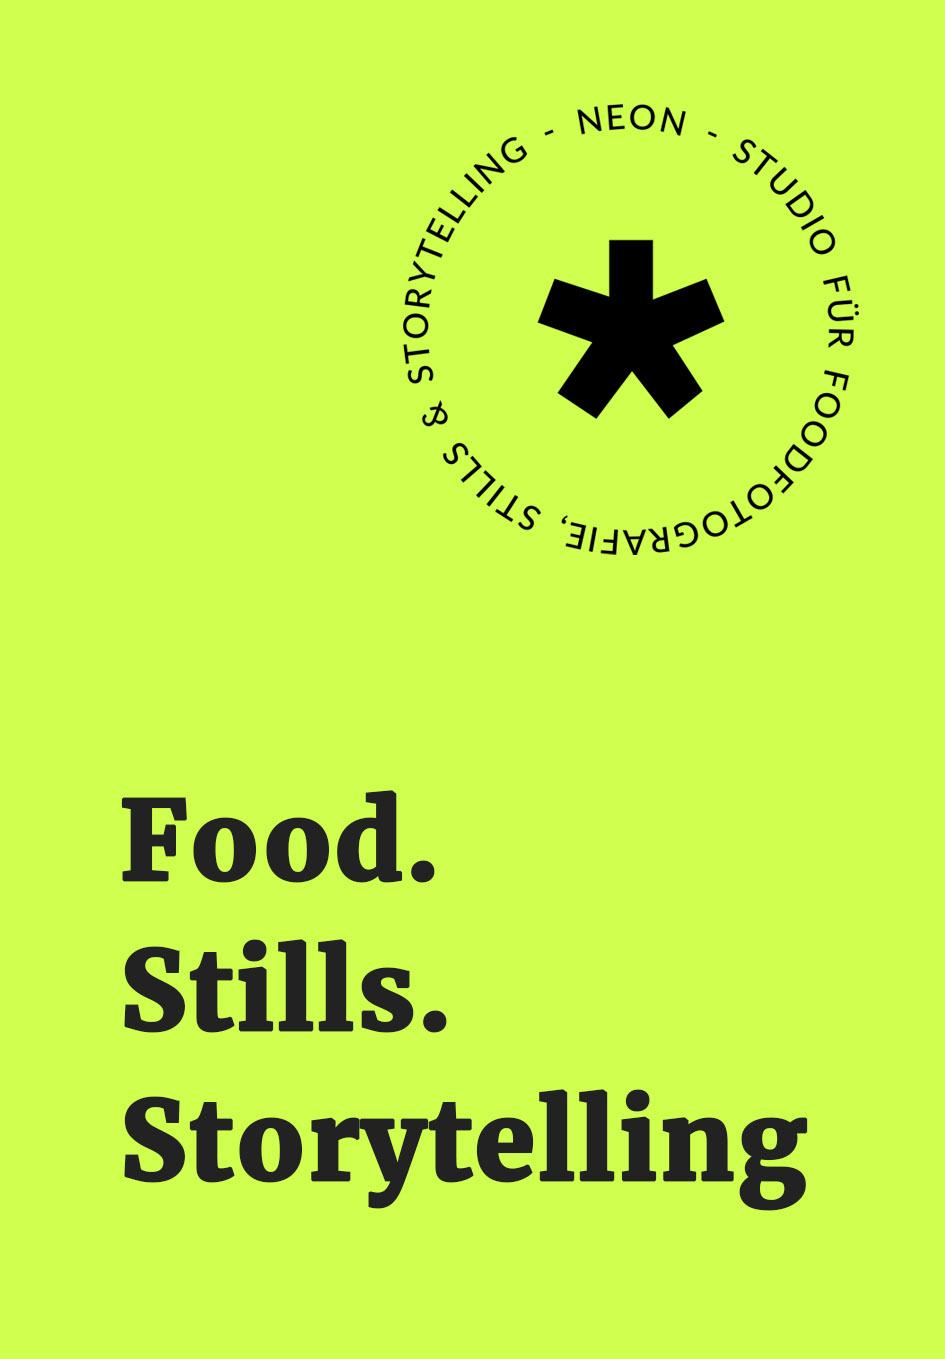 Food Stills Storytelling